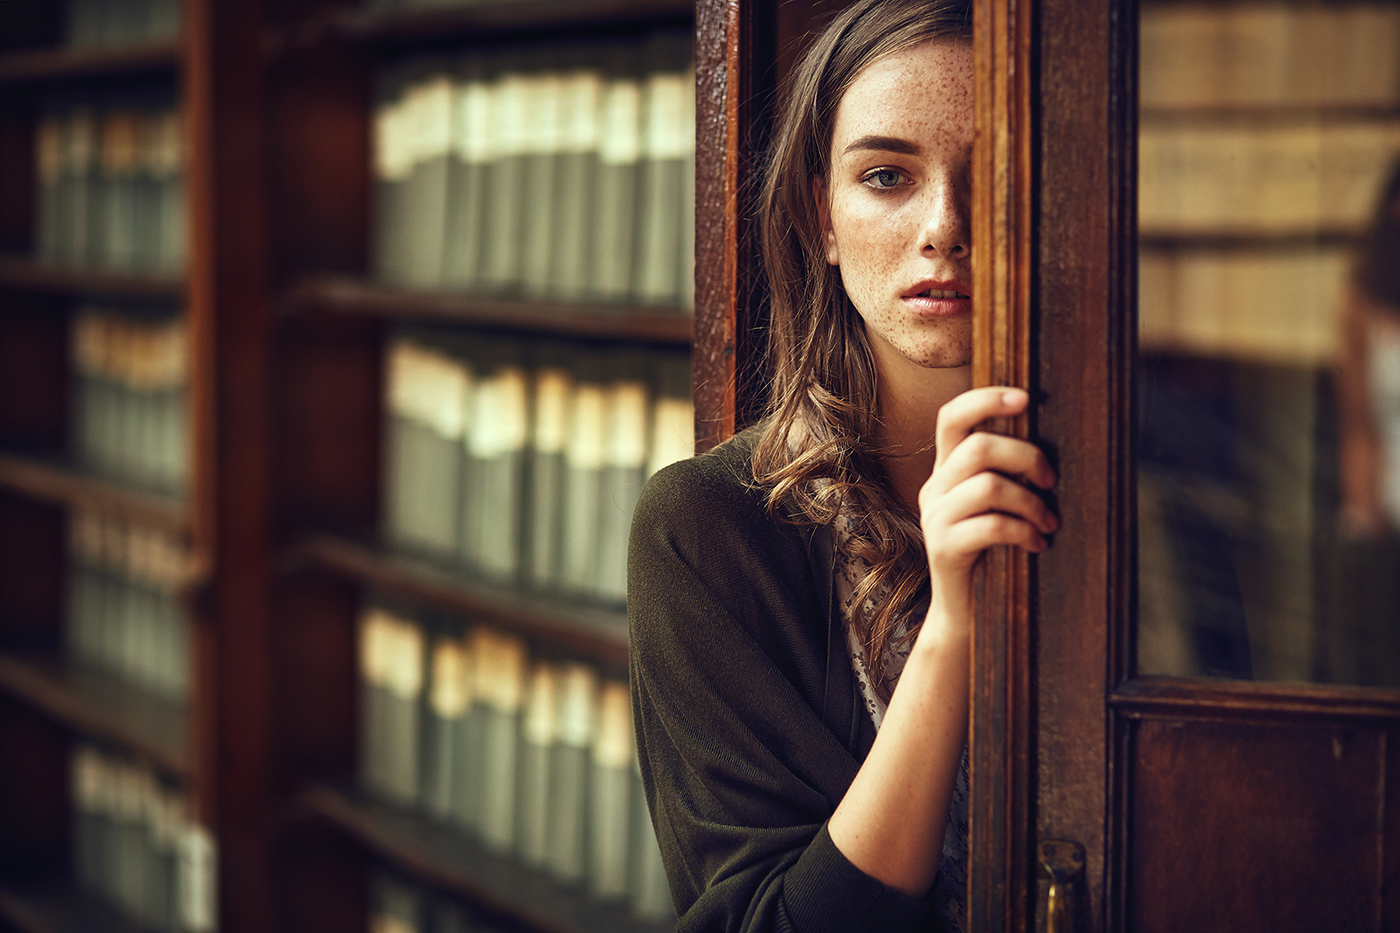 В библиотеке / фото Ярослав Мончак